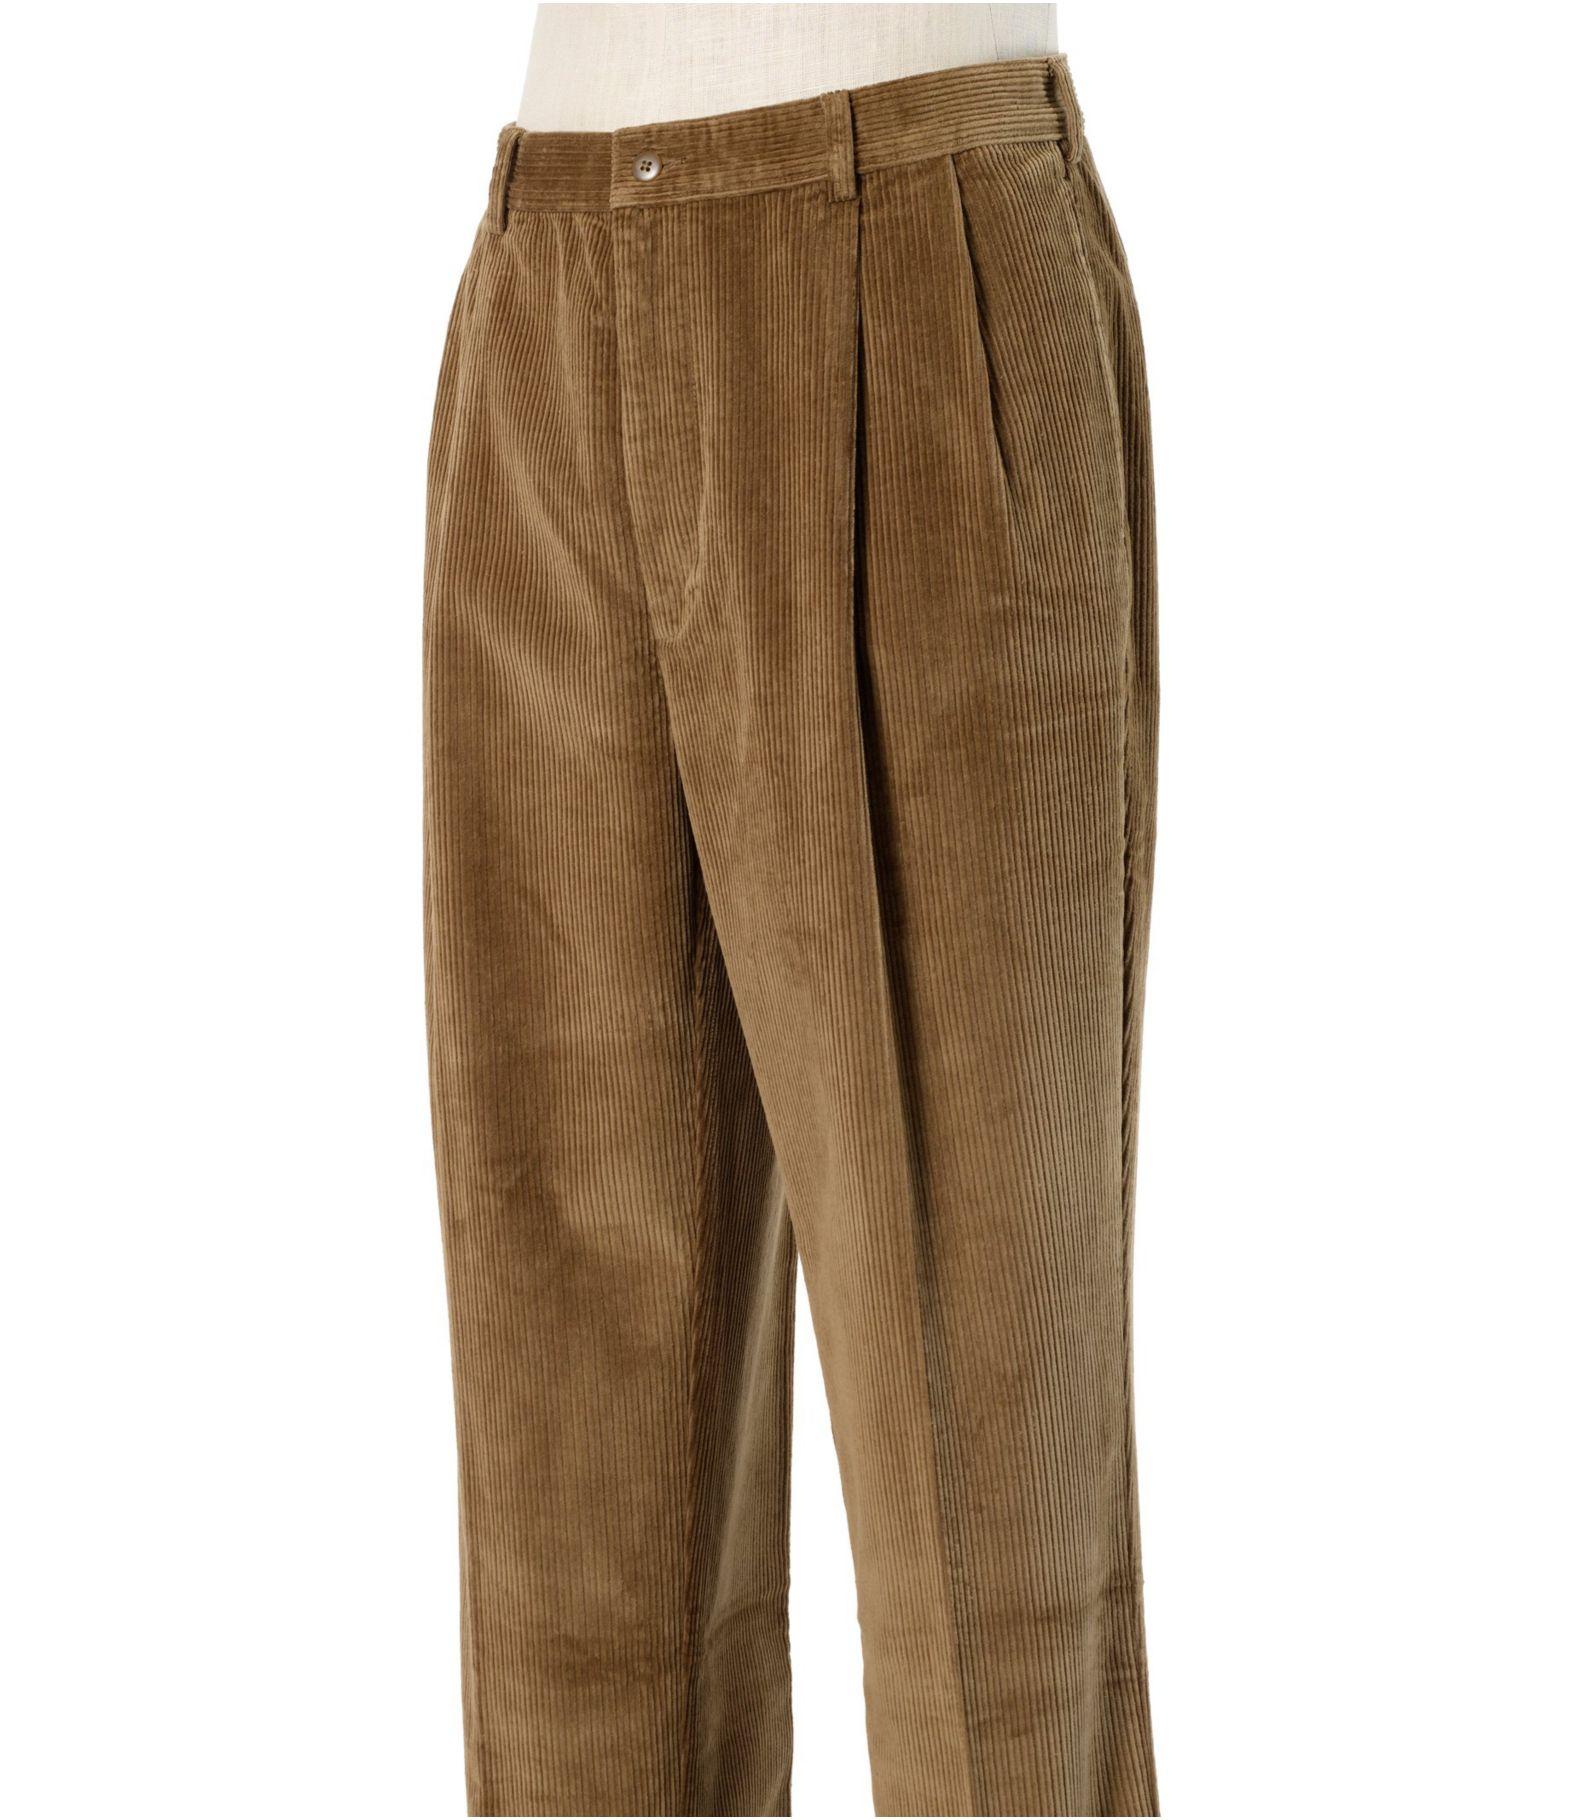 Cuffed Corduroy Pants